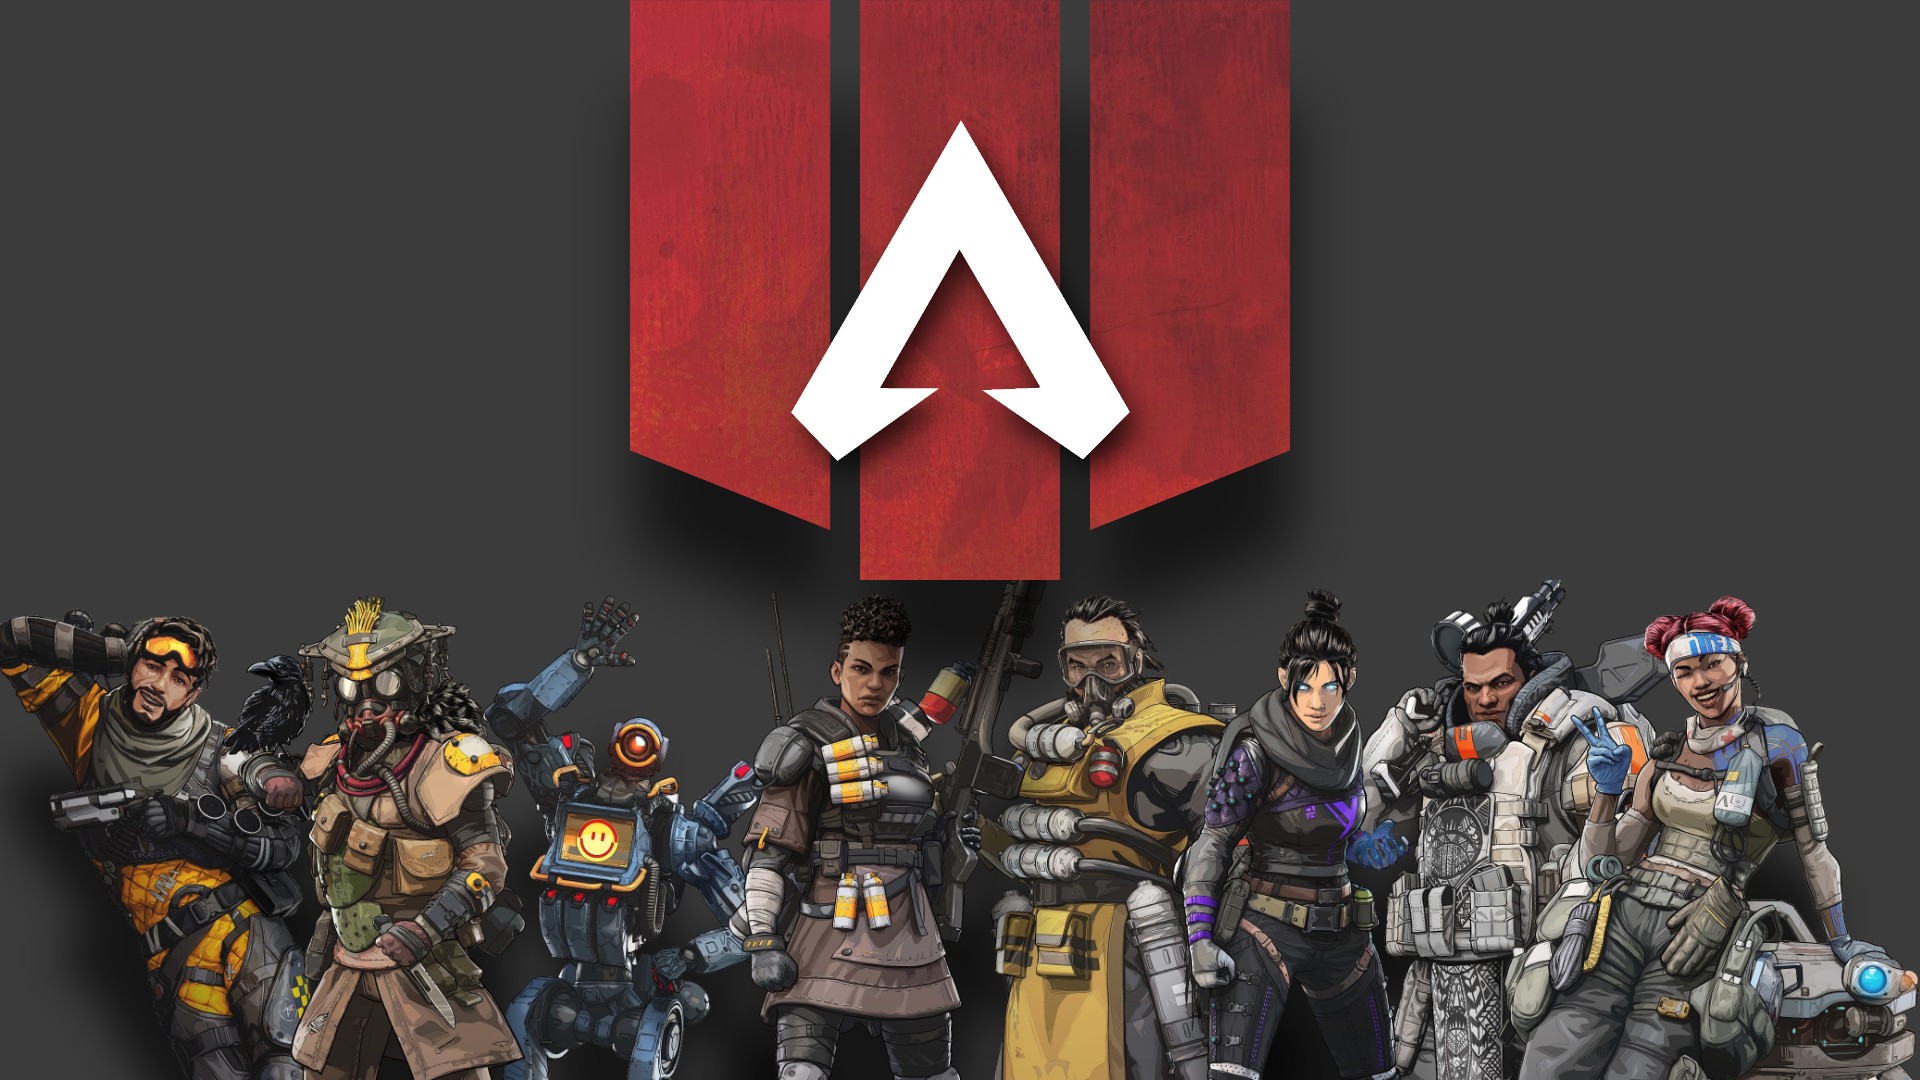 Video Game Apex Legends Pathfinder Apex Legends Wraith Apex Legends Mirage Apex Legends L Mobile Legend Wallpaper Background Images Wallpaper Backgrounds